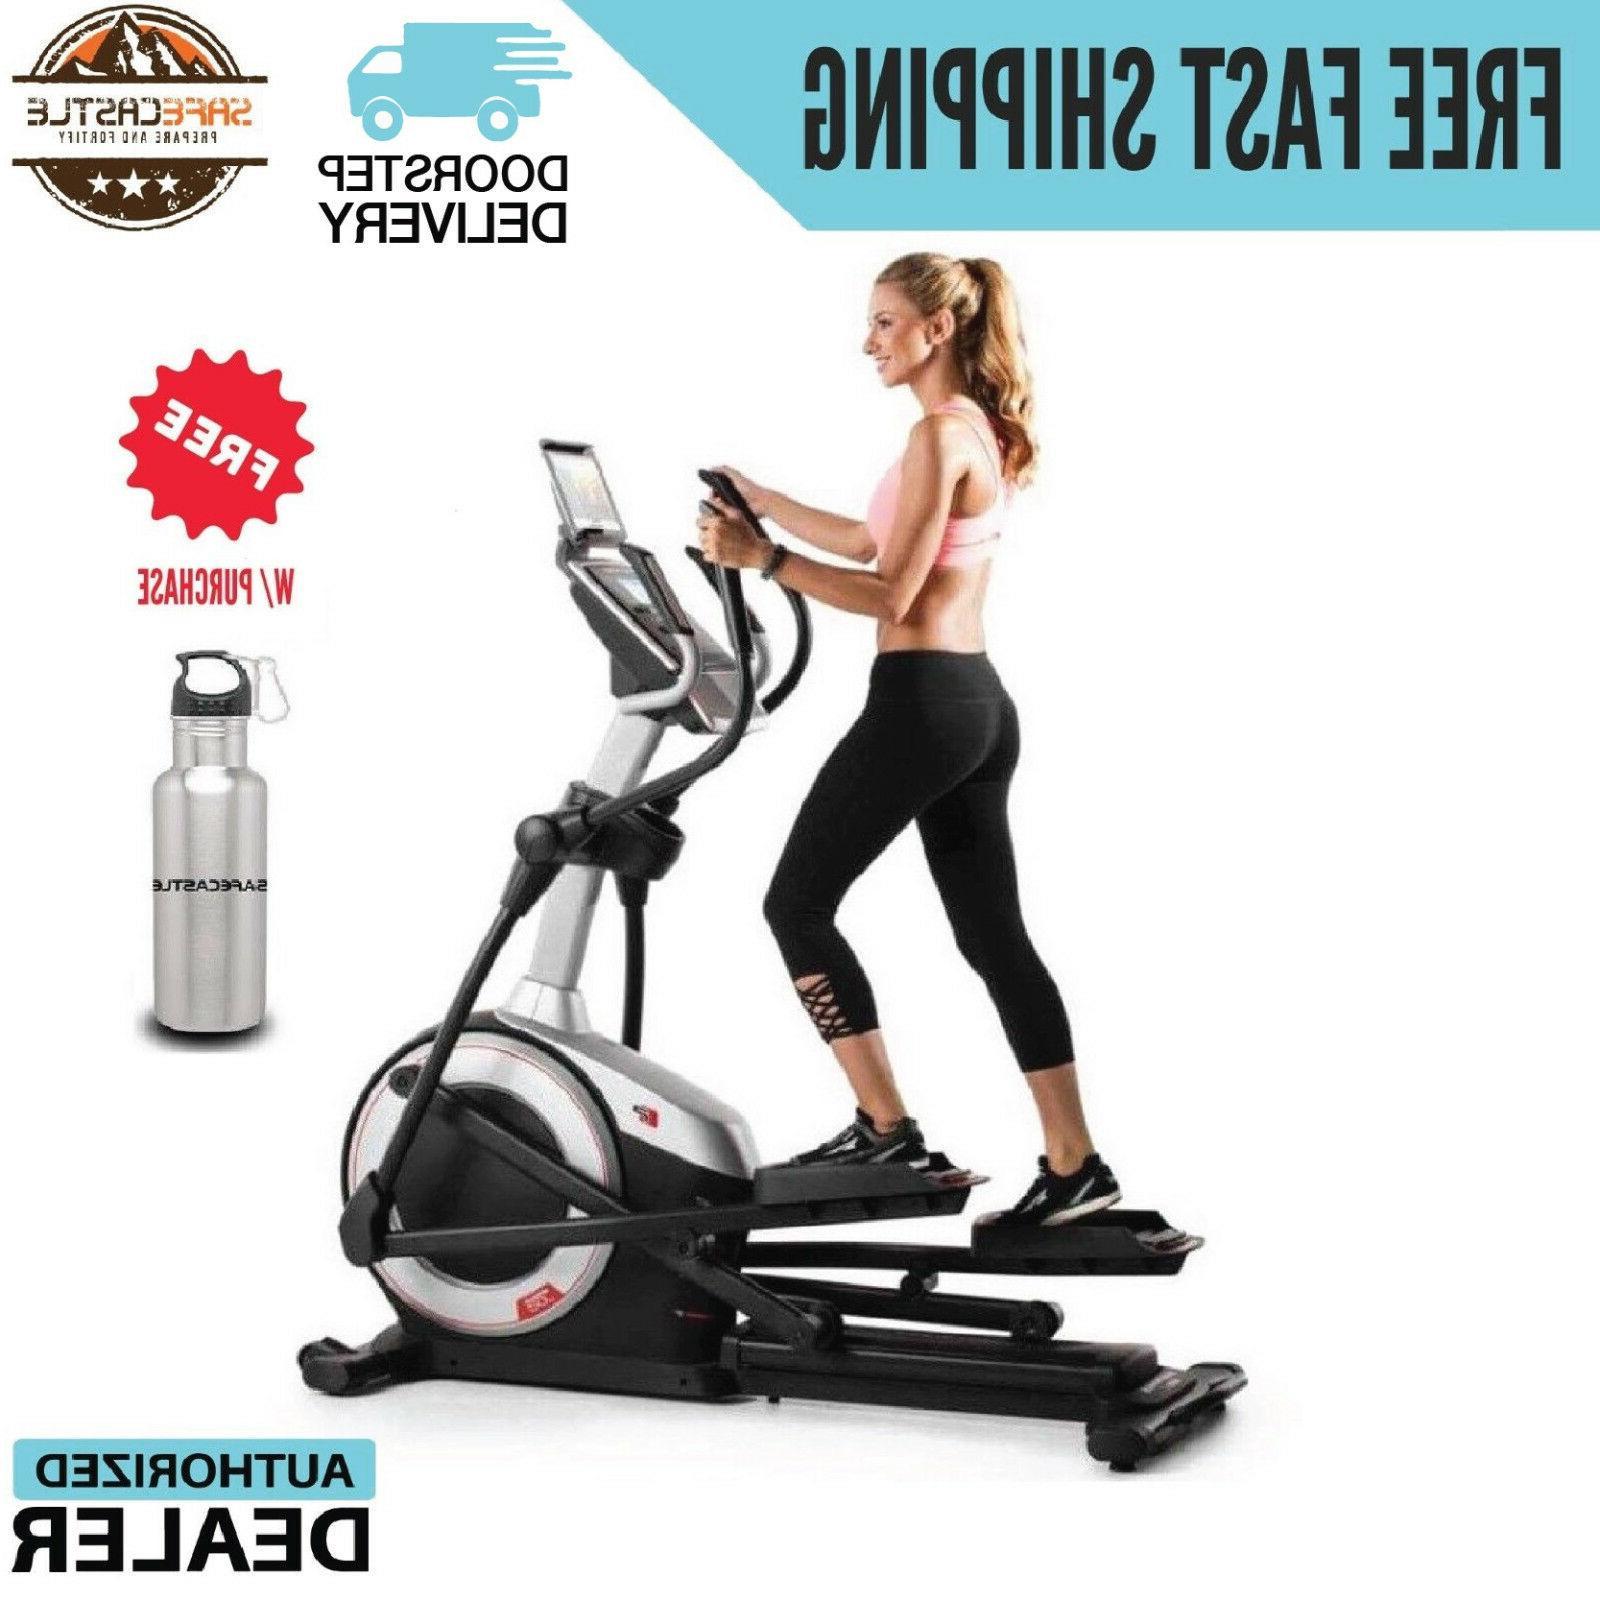 new endurance 520 e elliptical exercise machine